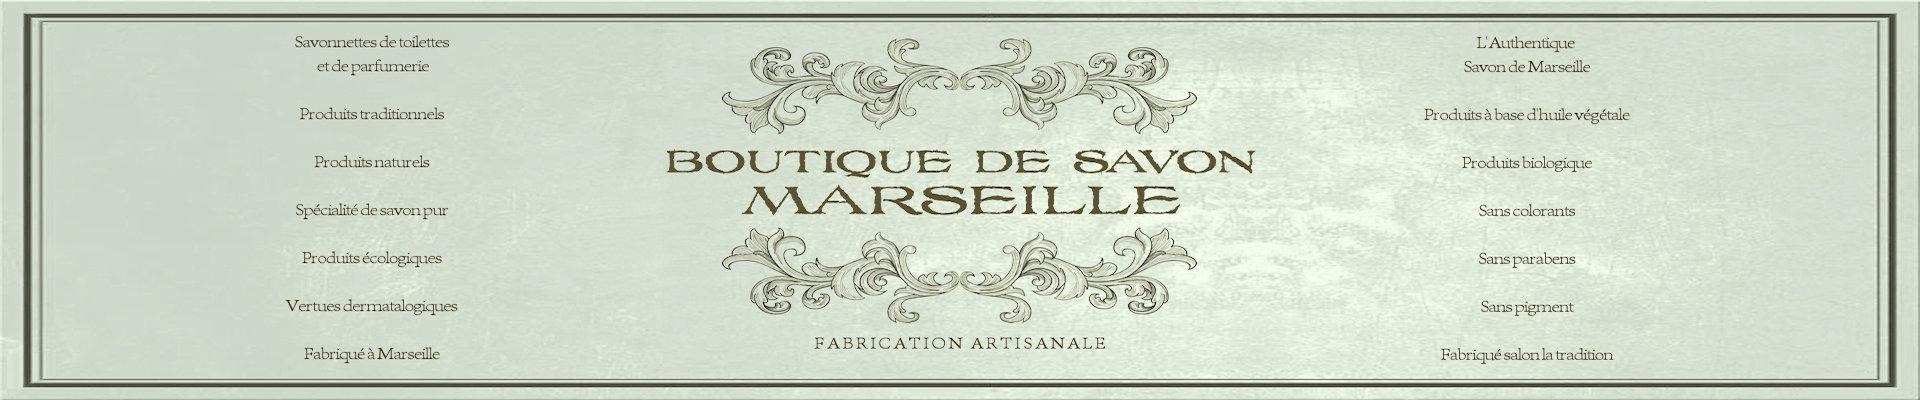 French Soaps Savonnerie.jpg